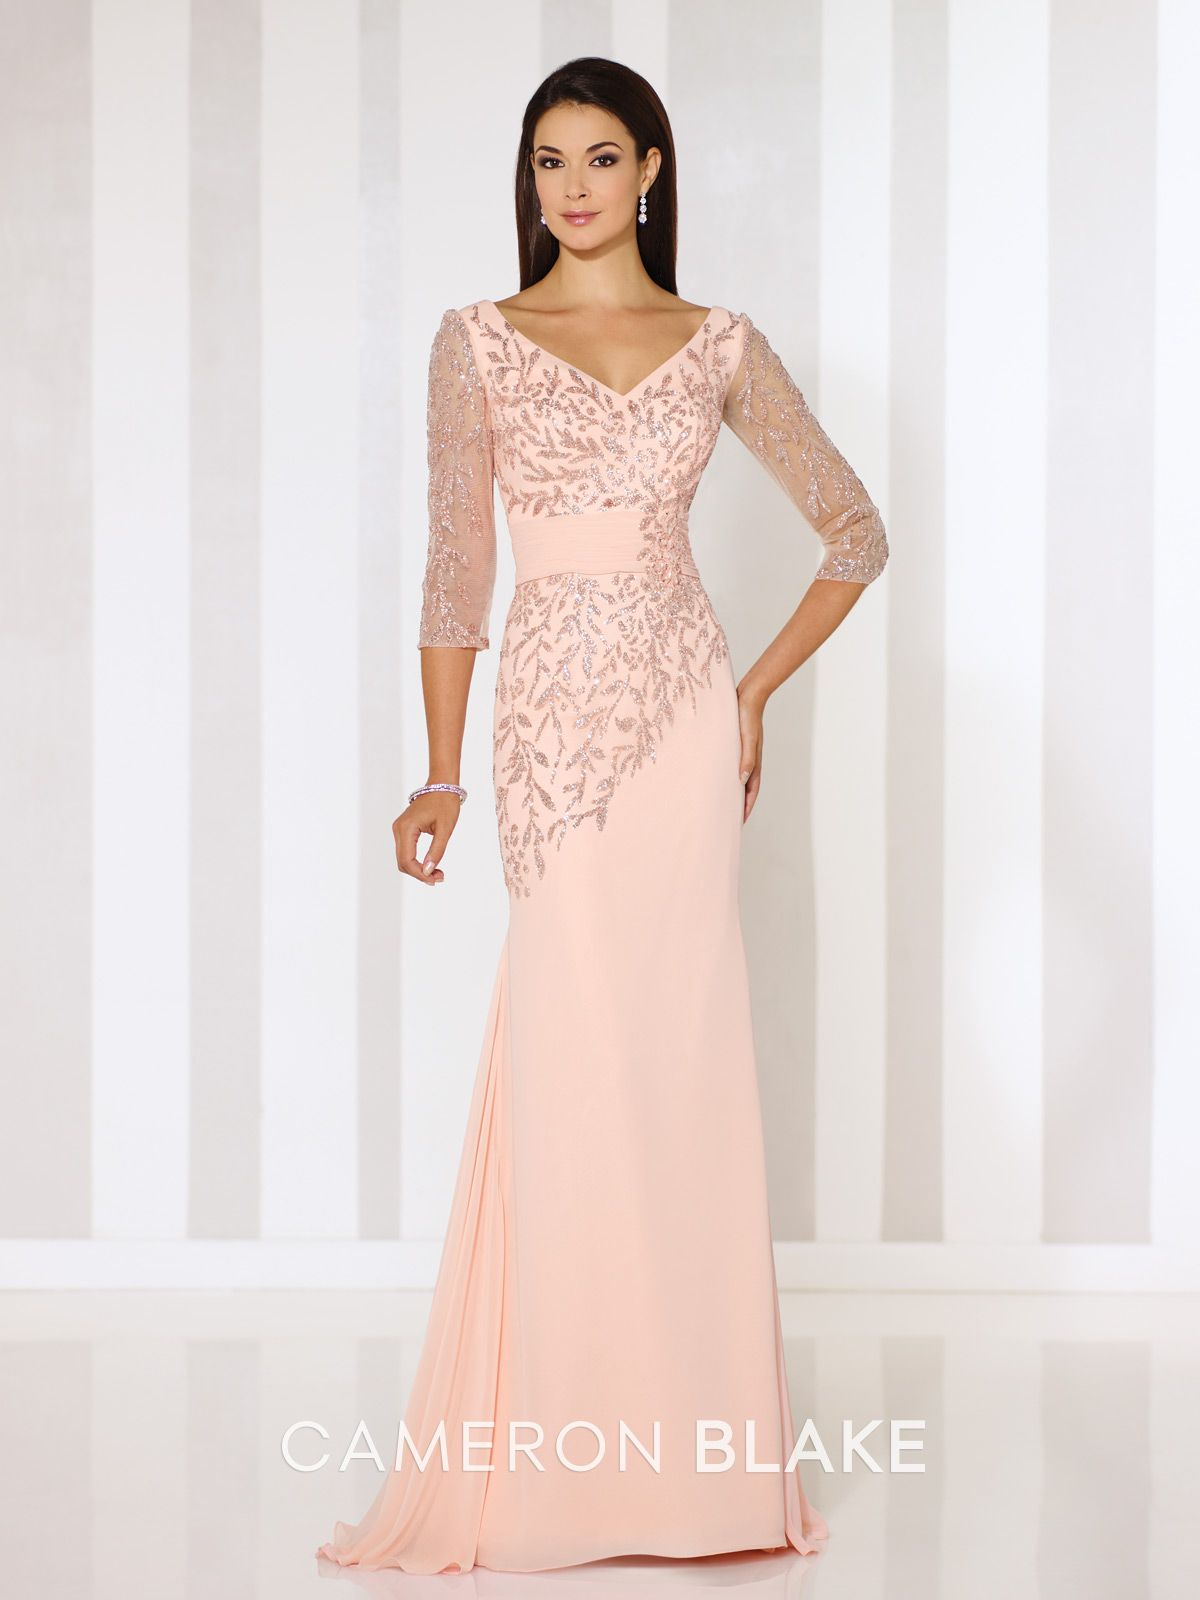 Cameron Blake - Evening Dresses - 116651 | Vestiditos, Vestidos de ...